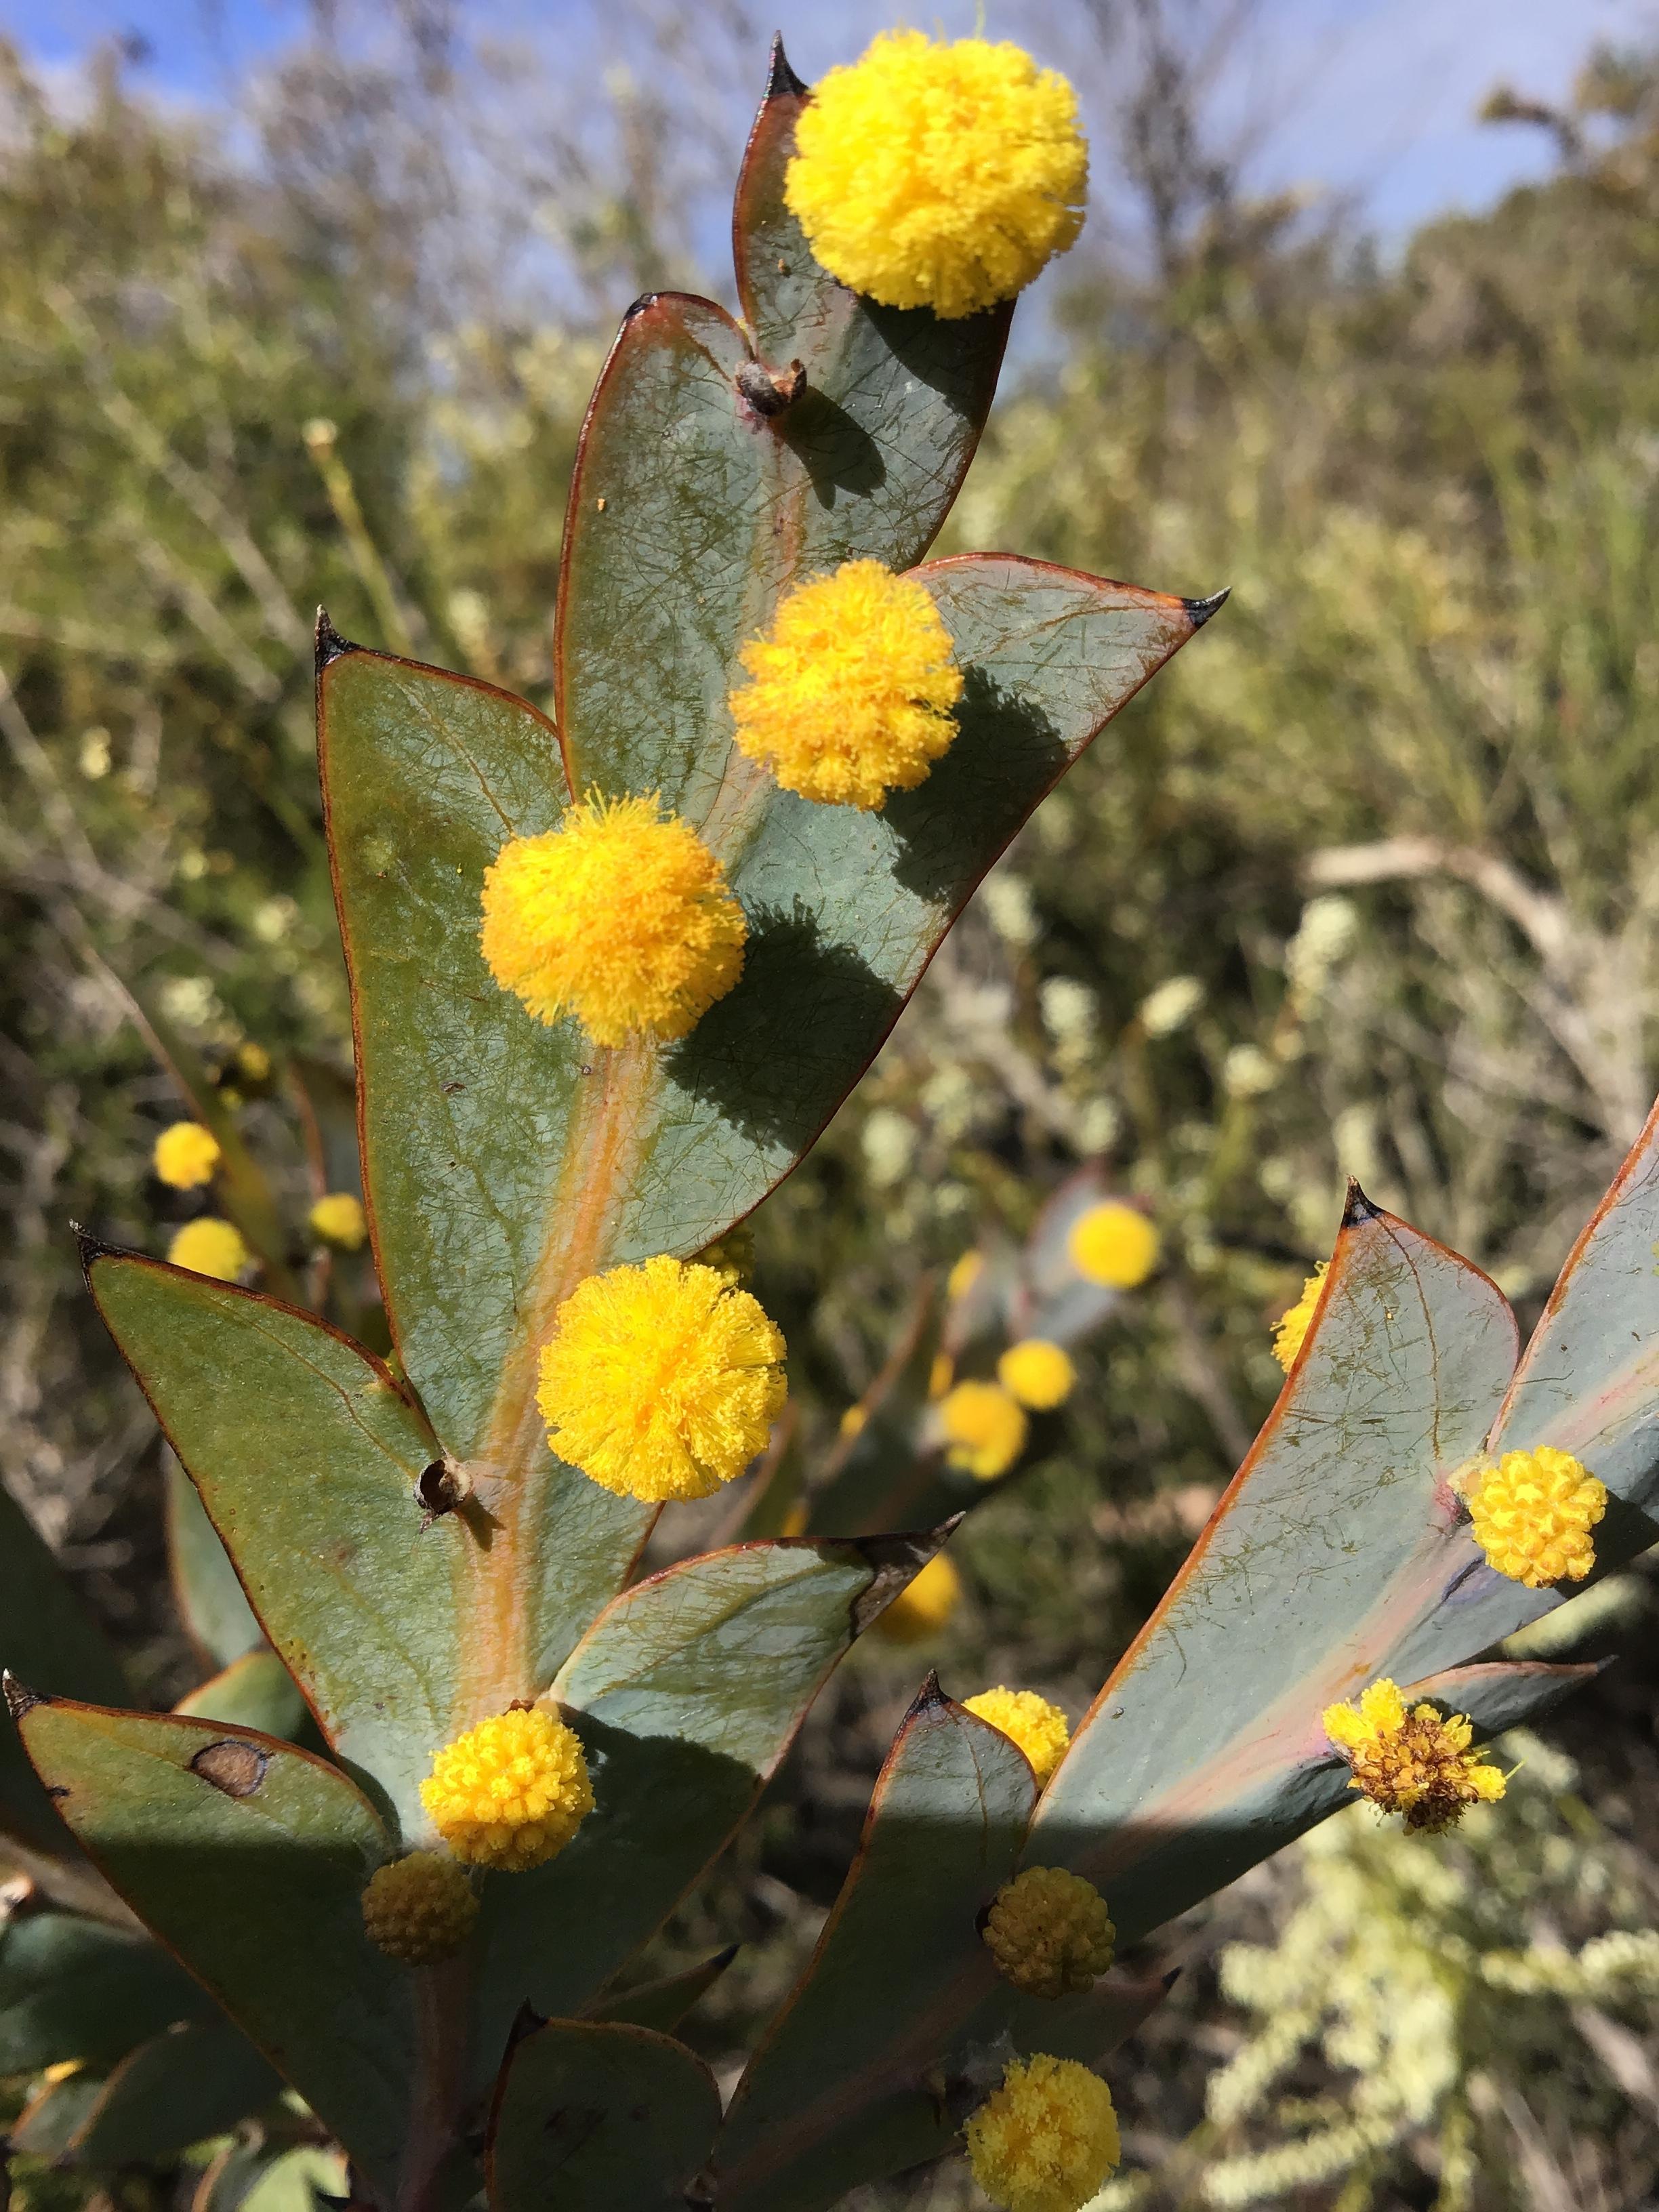 Acacia Glaucoptera - Flat Acacia in the Ravensthorpe Ranges